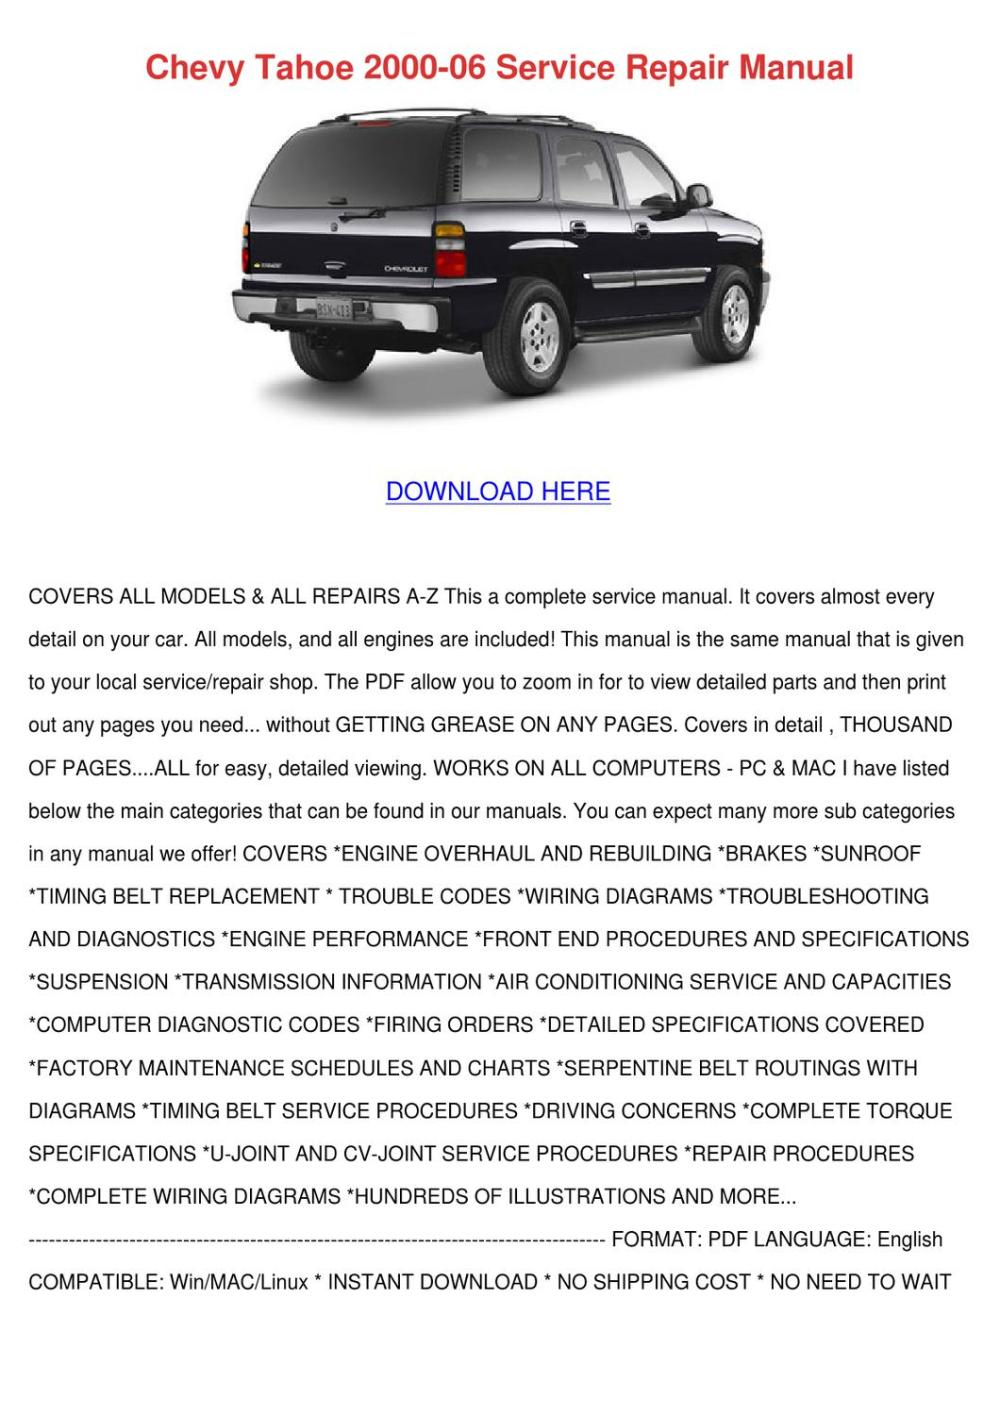 medium resolution of chevy tahoe 2000 06 service repair manual